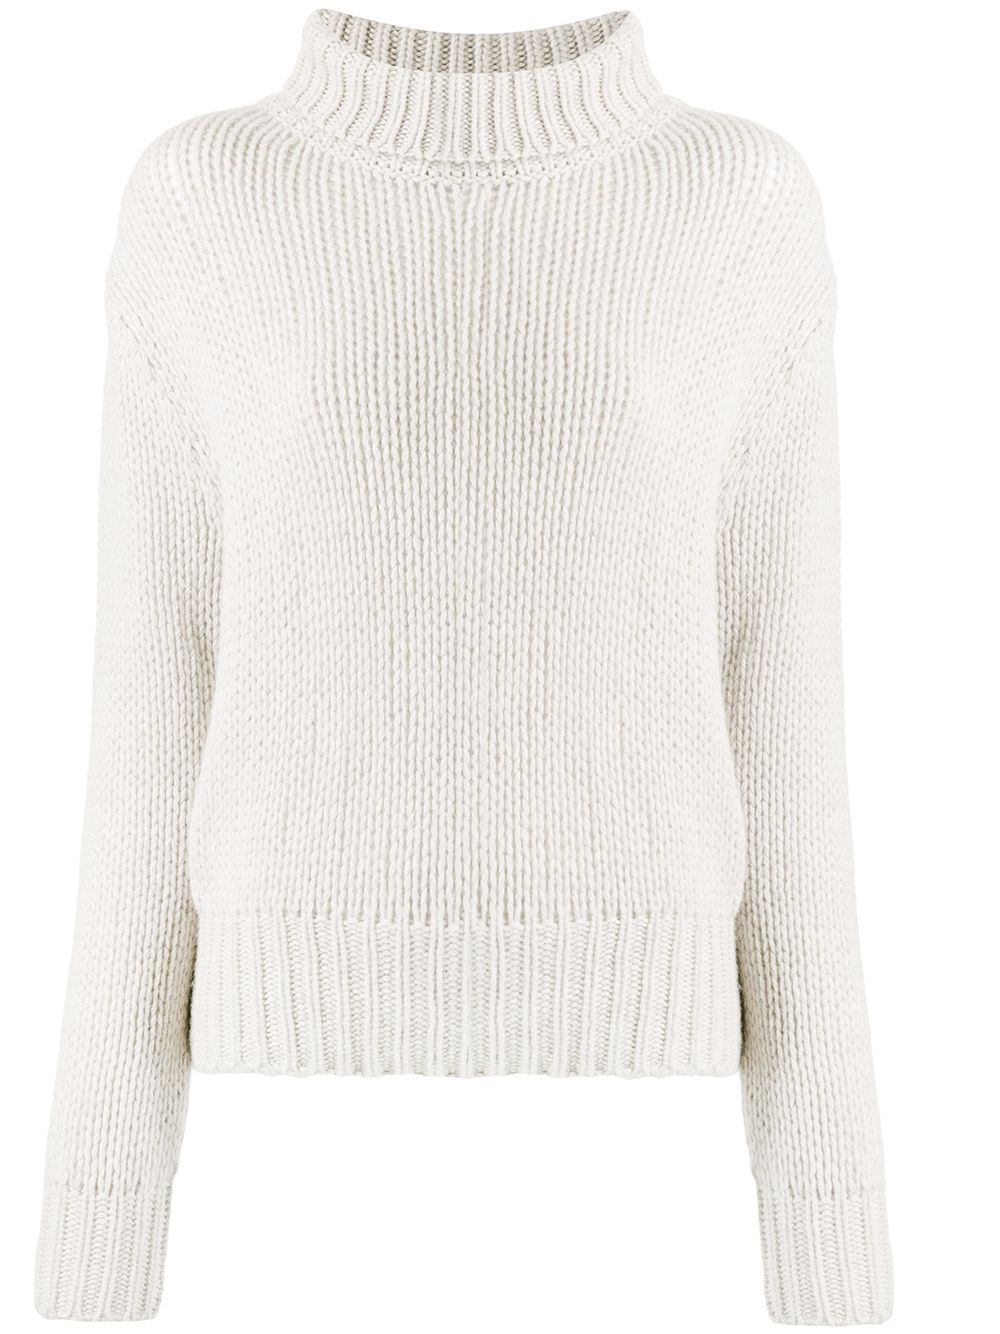 Aragona chunky knit jumper - White